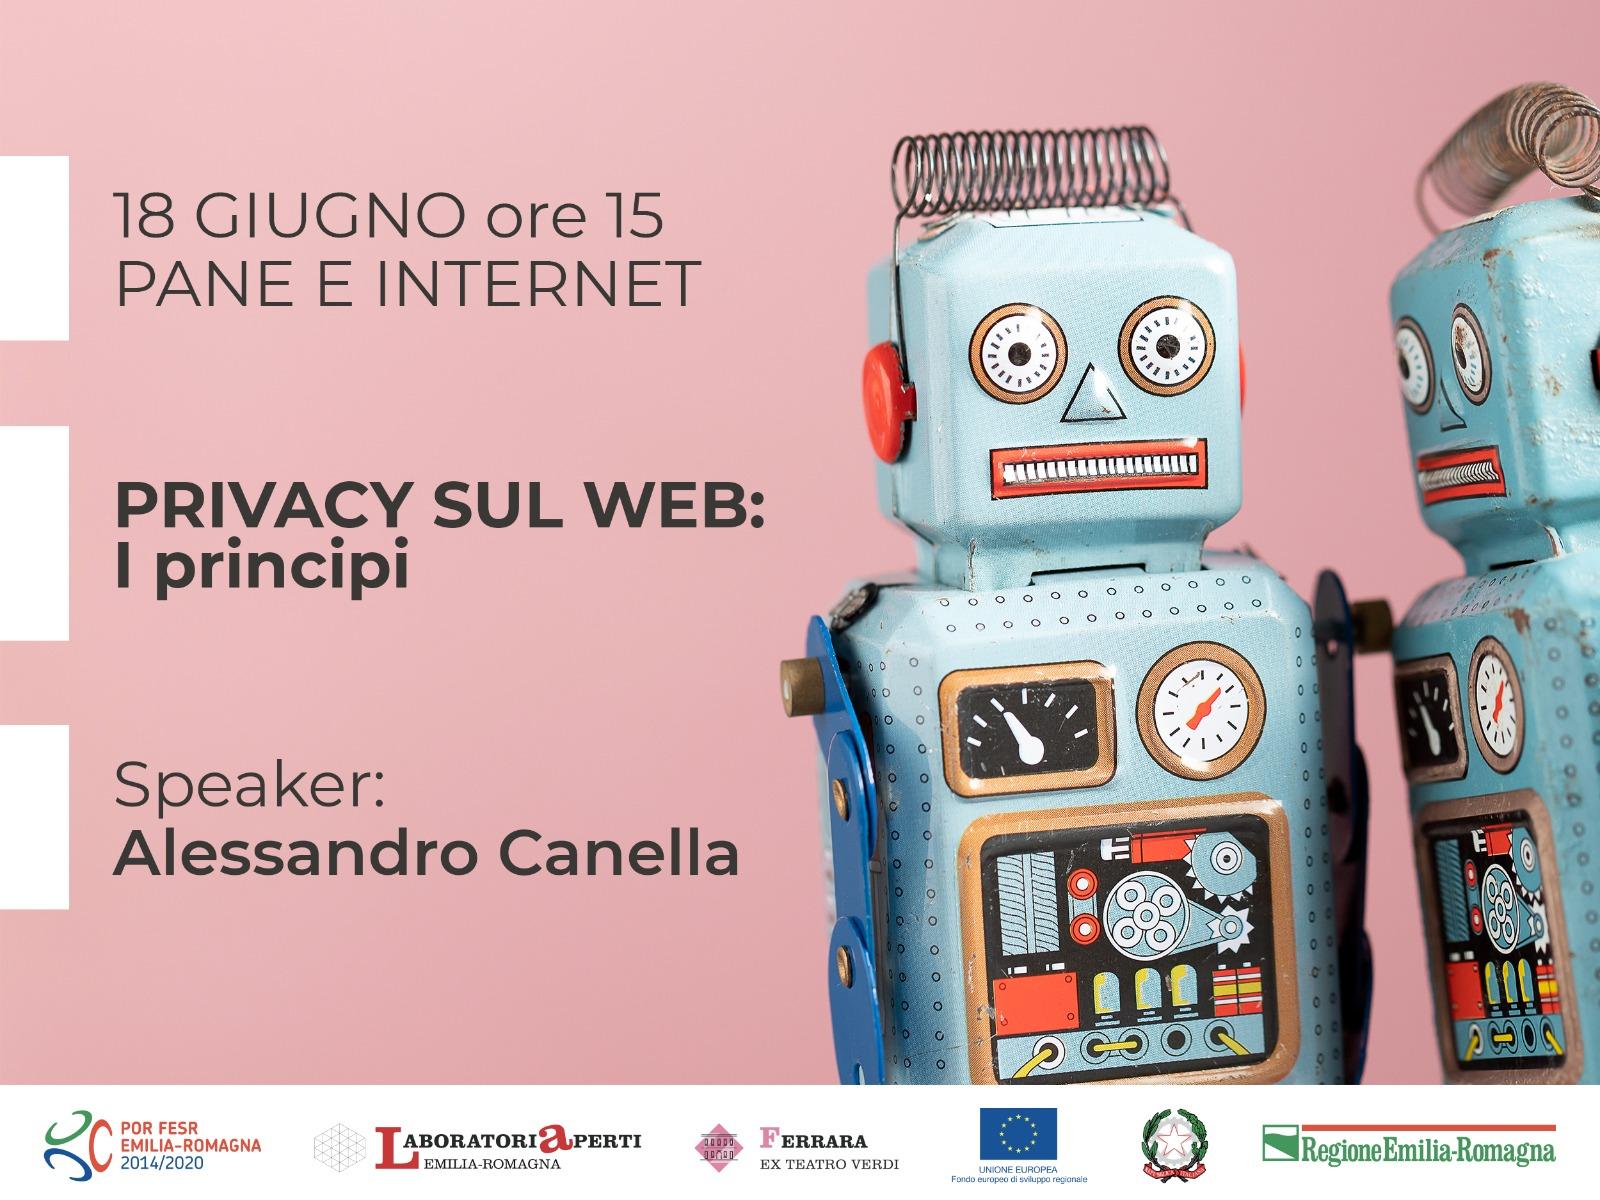 18 GIUGNO: ONLINE PRIVACY SUL WEB: I PRINCIPI